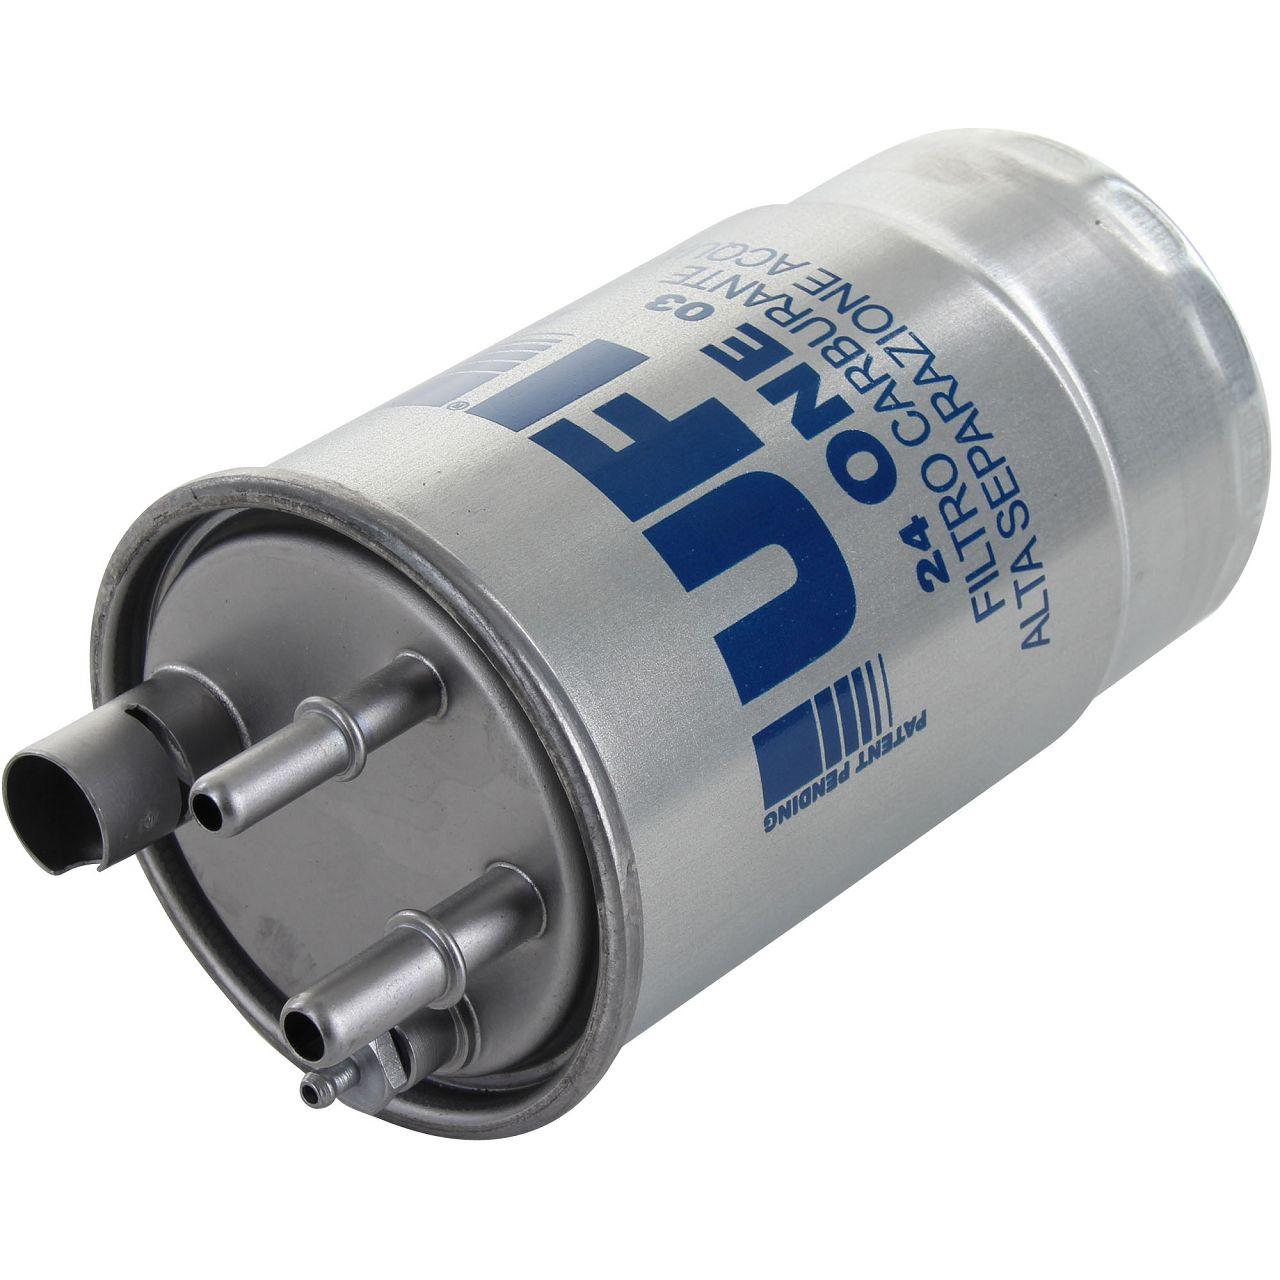 UFI Kraftstofffilter Dieselfilter für Opel Meriva A 1.3CDTI 69/75 PS 24.ONE.03